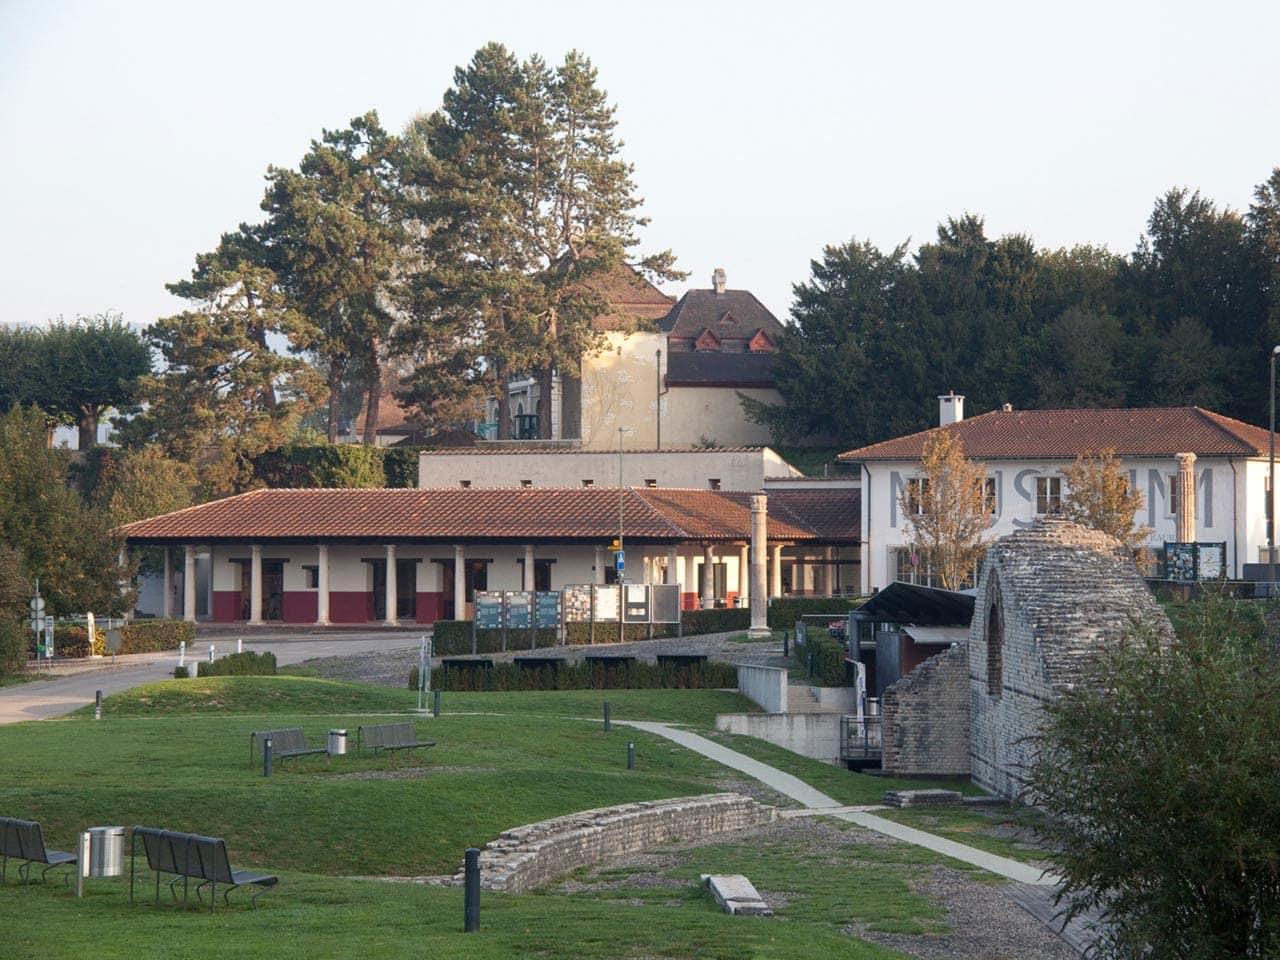 Augusta Raurica – Spuren der antiken Römerstadt